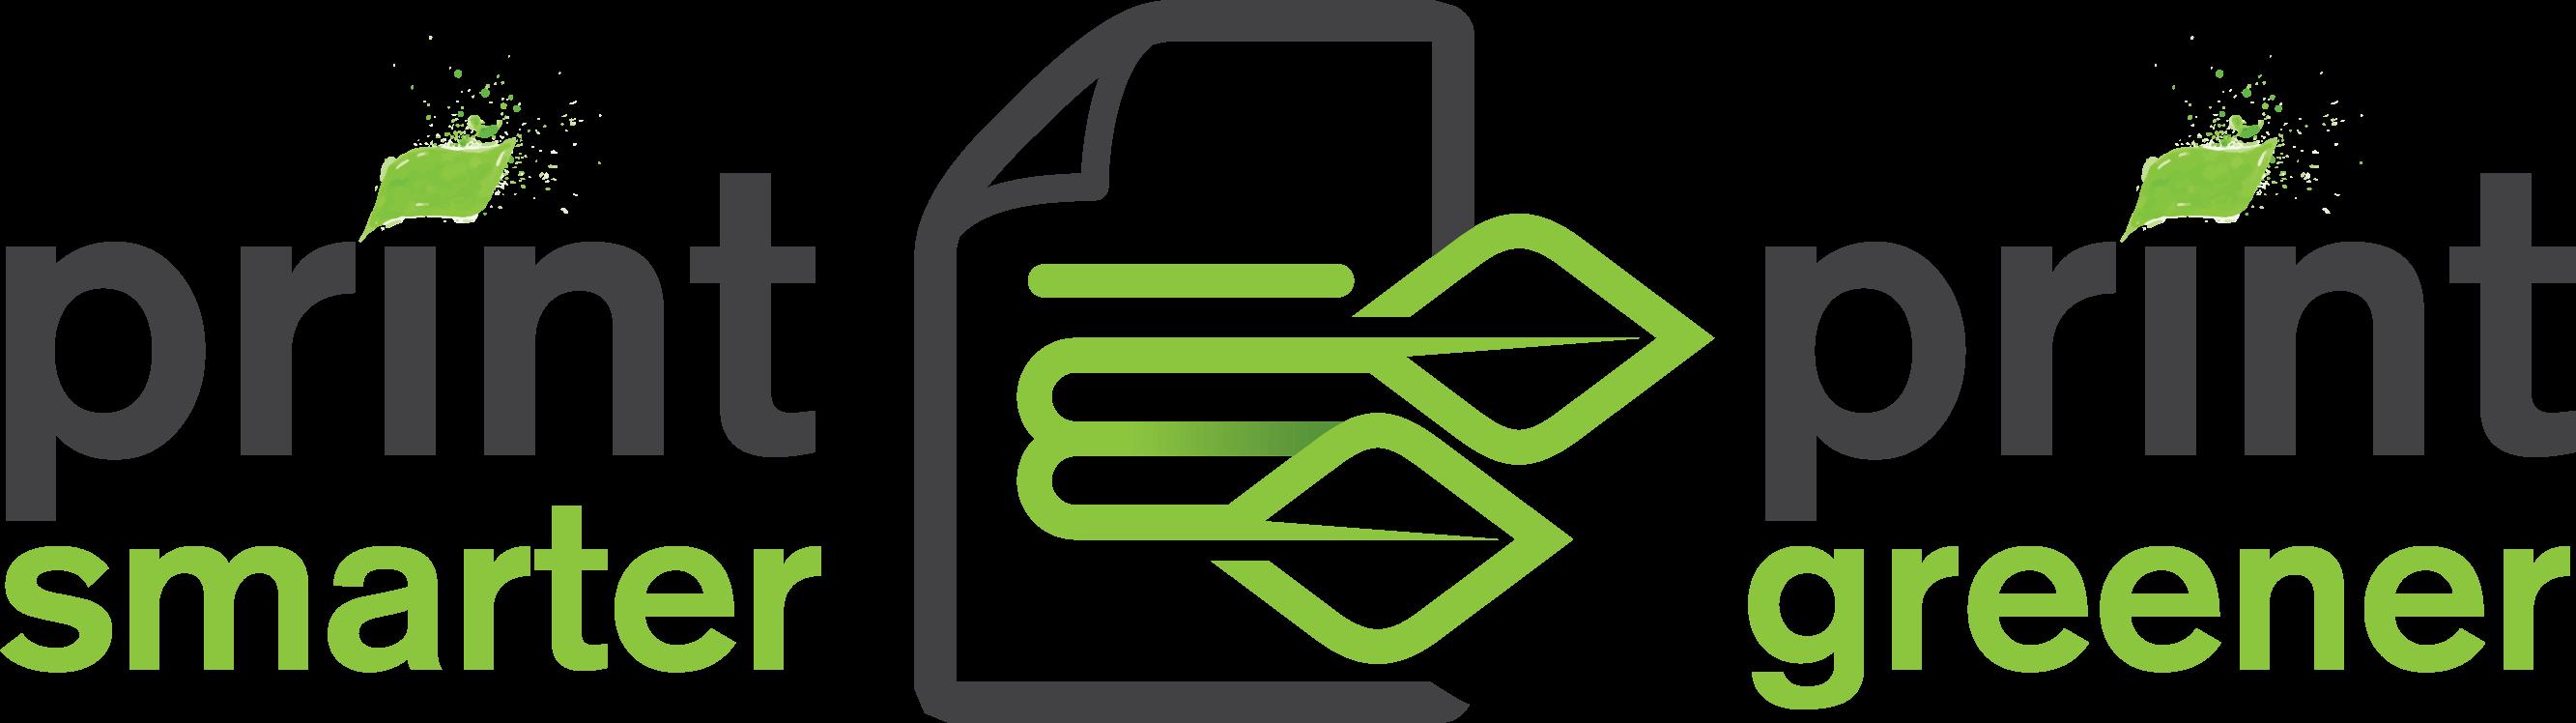 Print Smarter Print Greener Logo